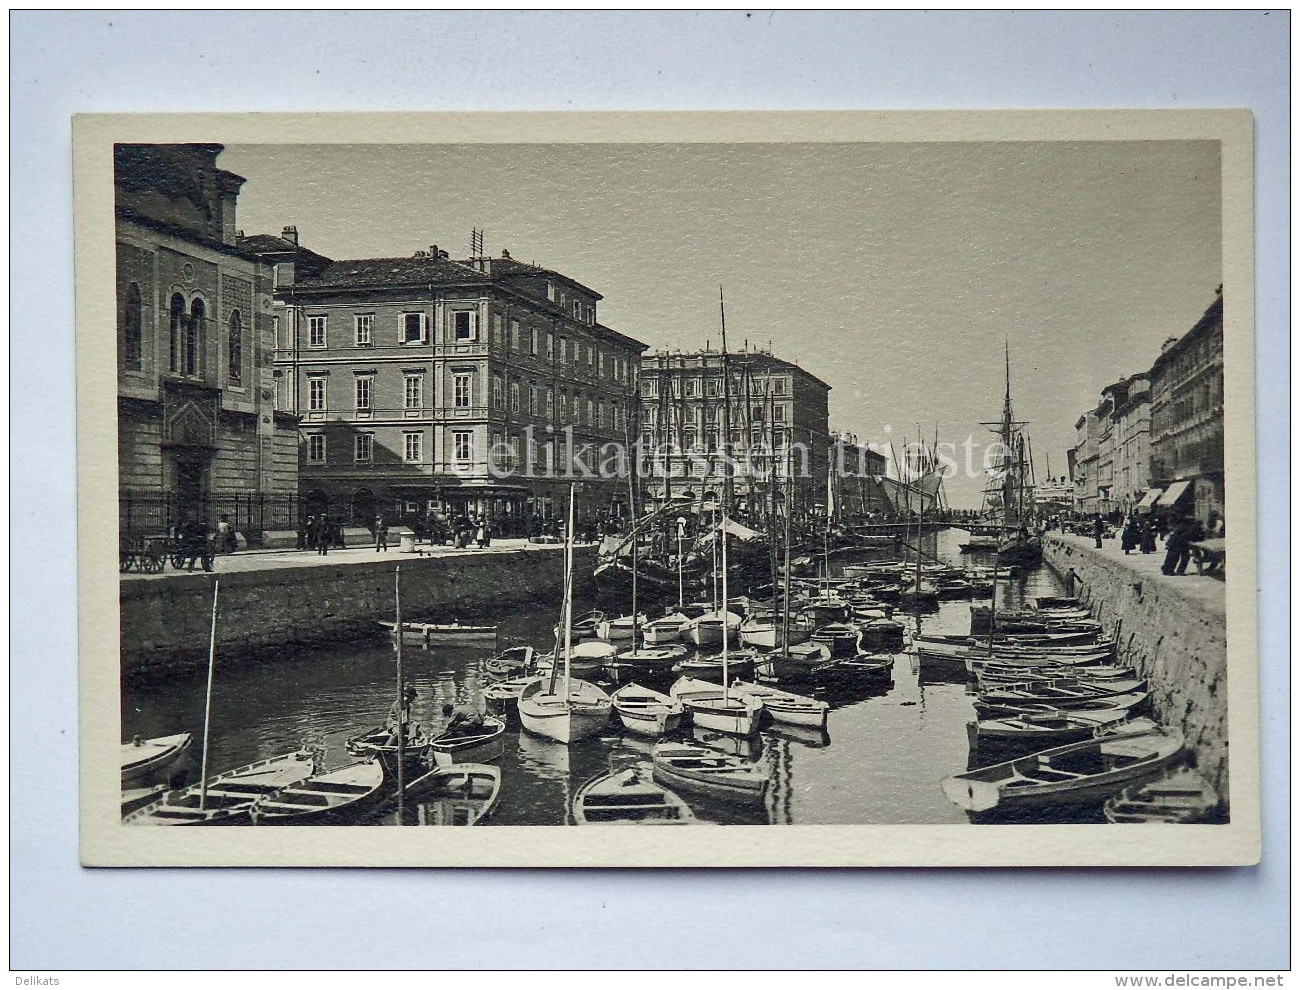 TRIESTE Canale Barca Vela Pesca Veliero Vecchia Cartolina 22543 - Trieste